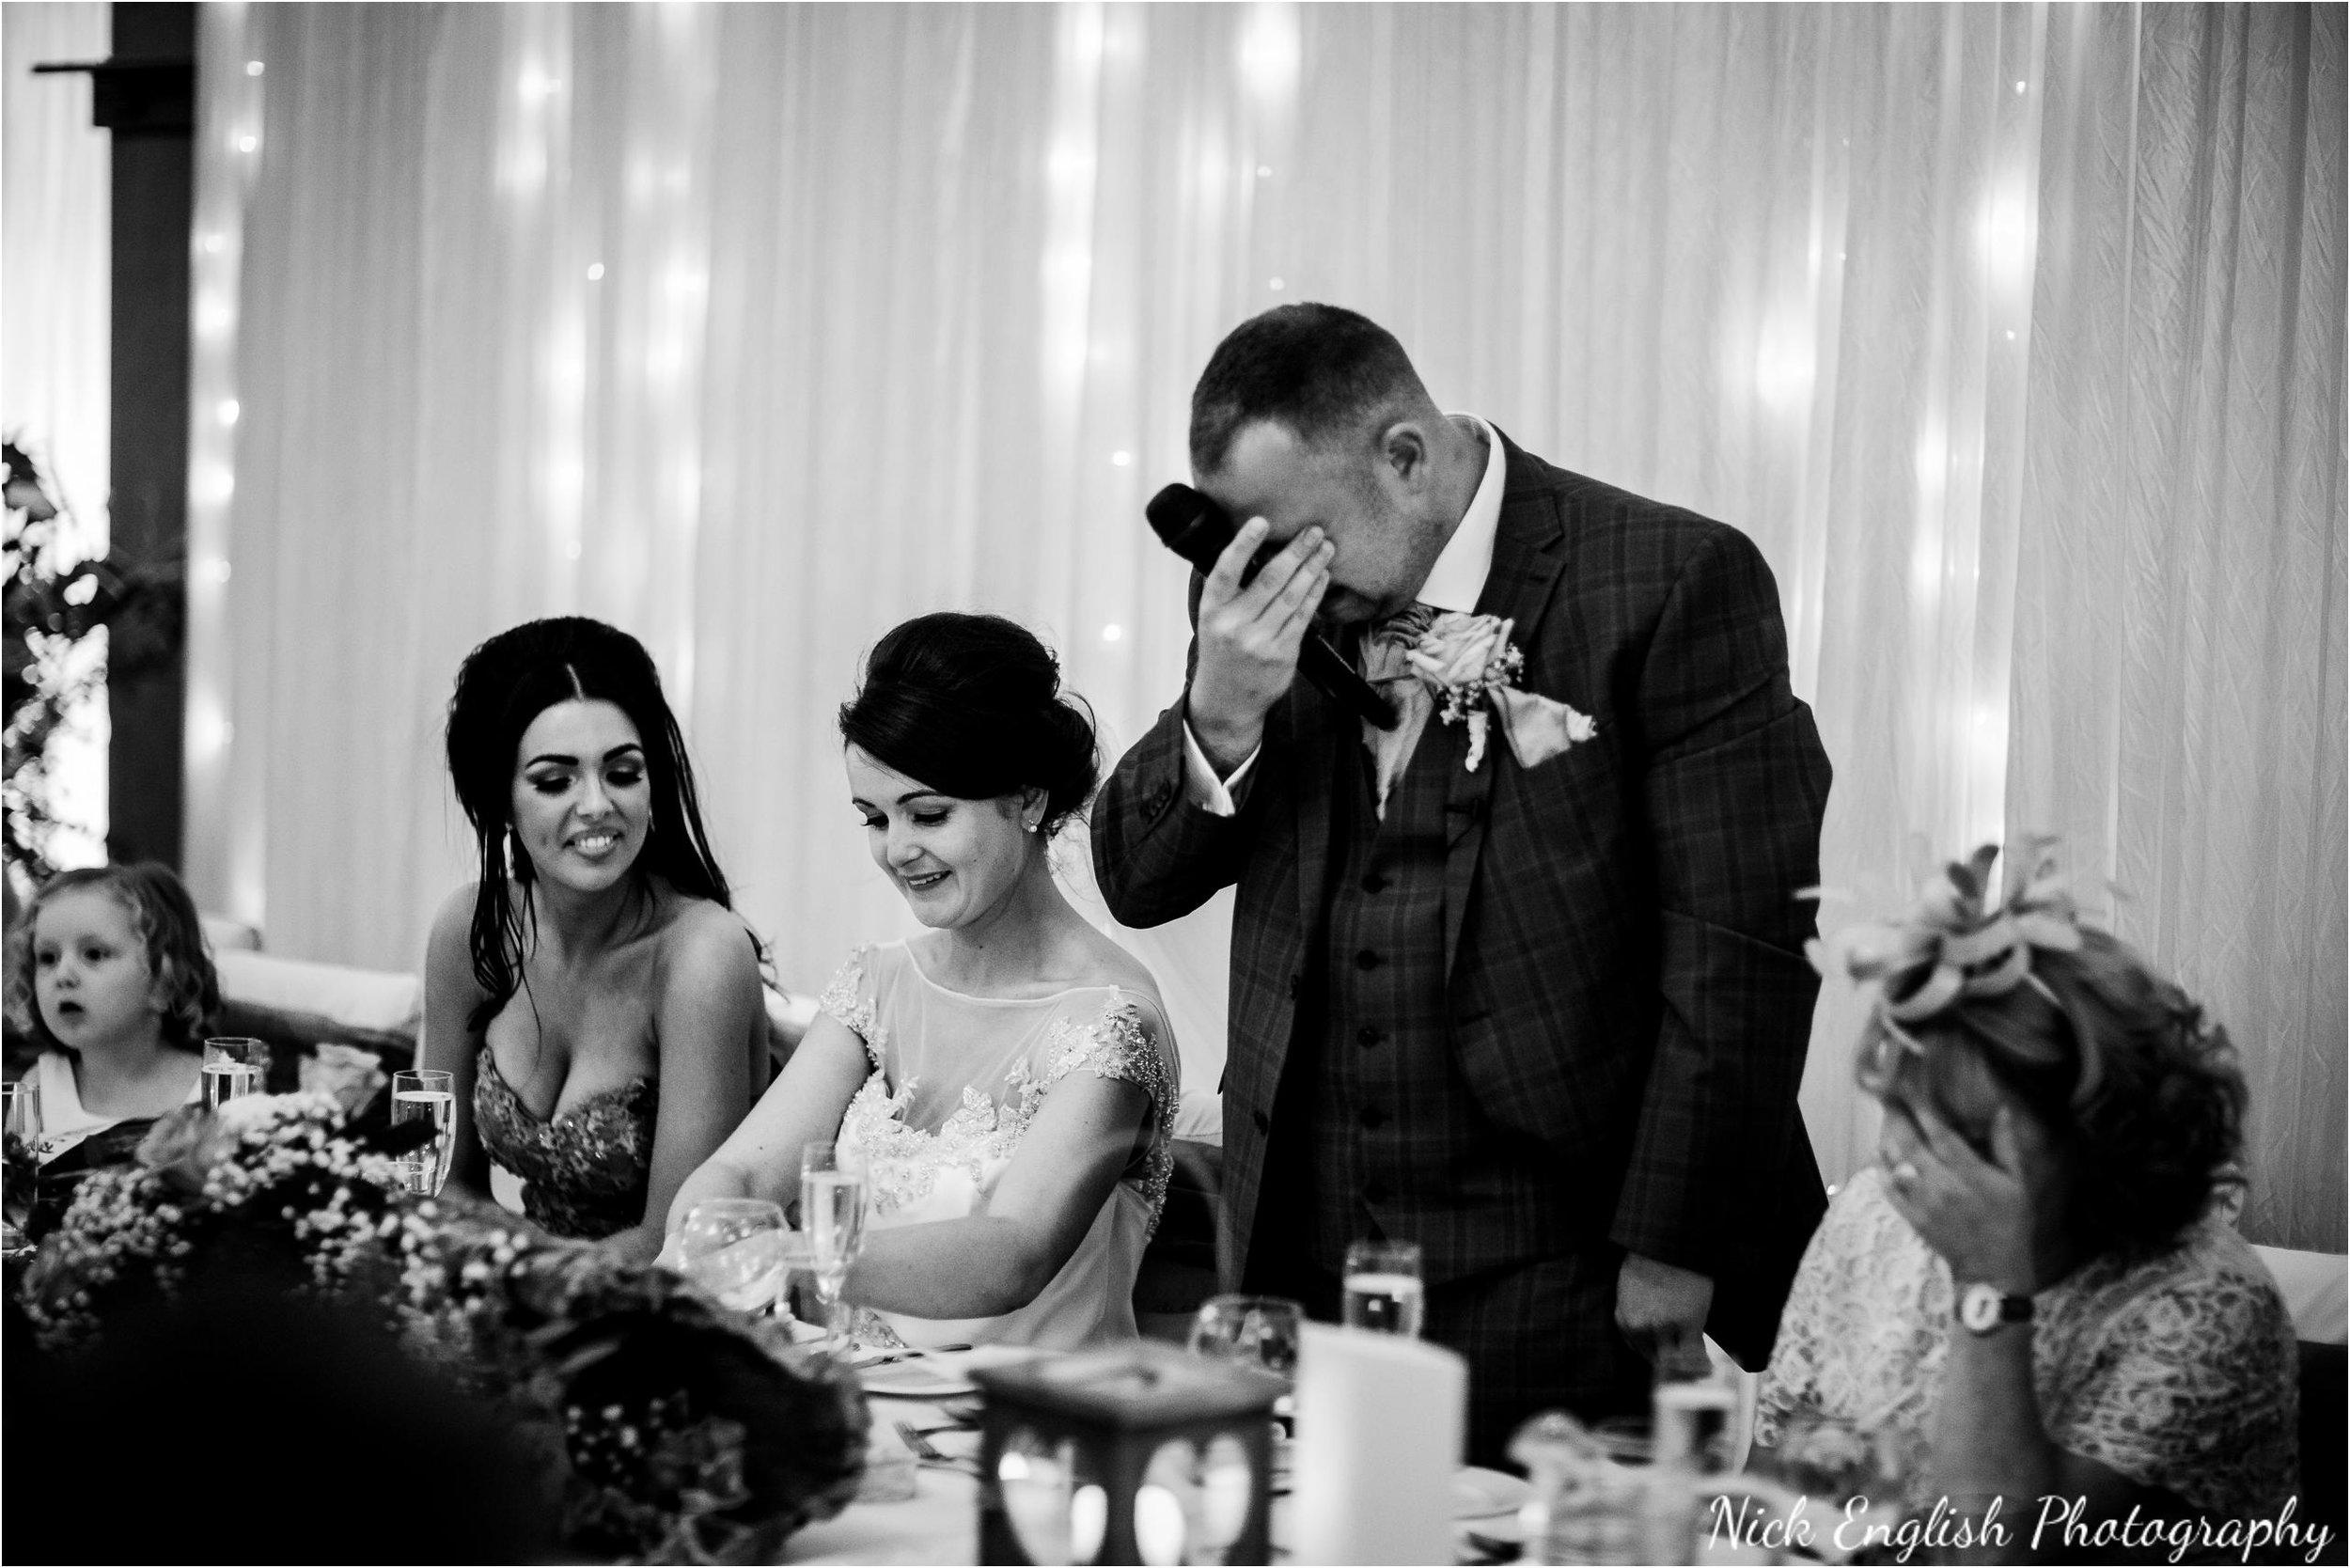 Stacey-Ash-Wedding-Photographs-Stanley-House-Preston-Lancashire-164.jpg